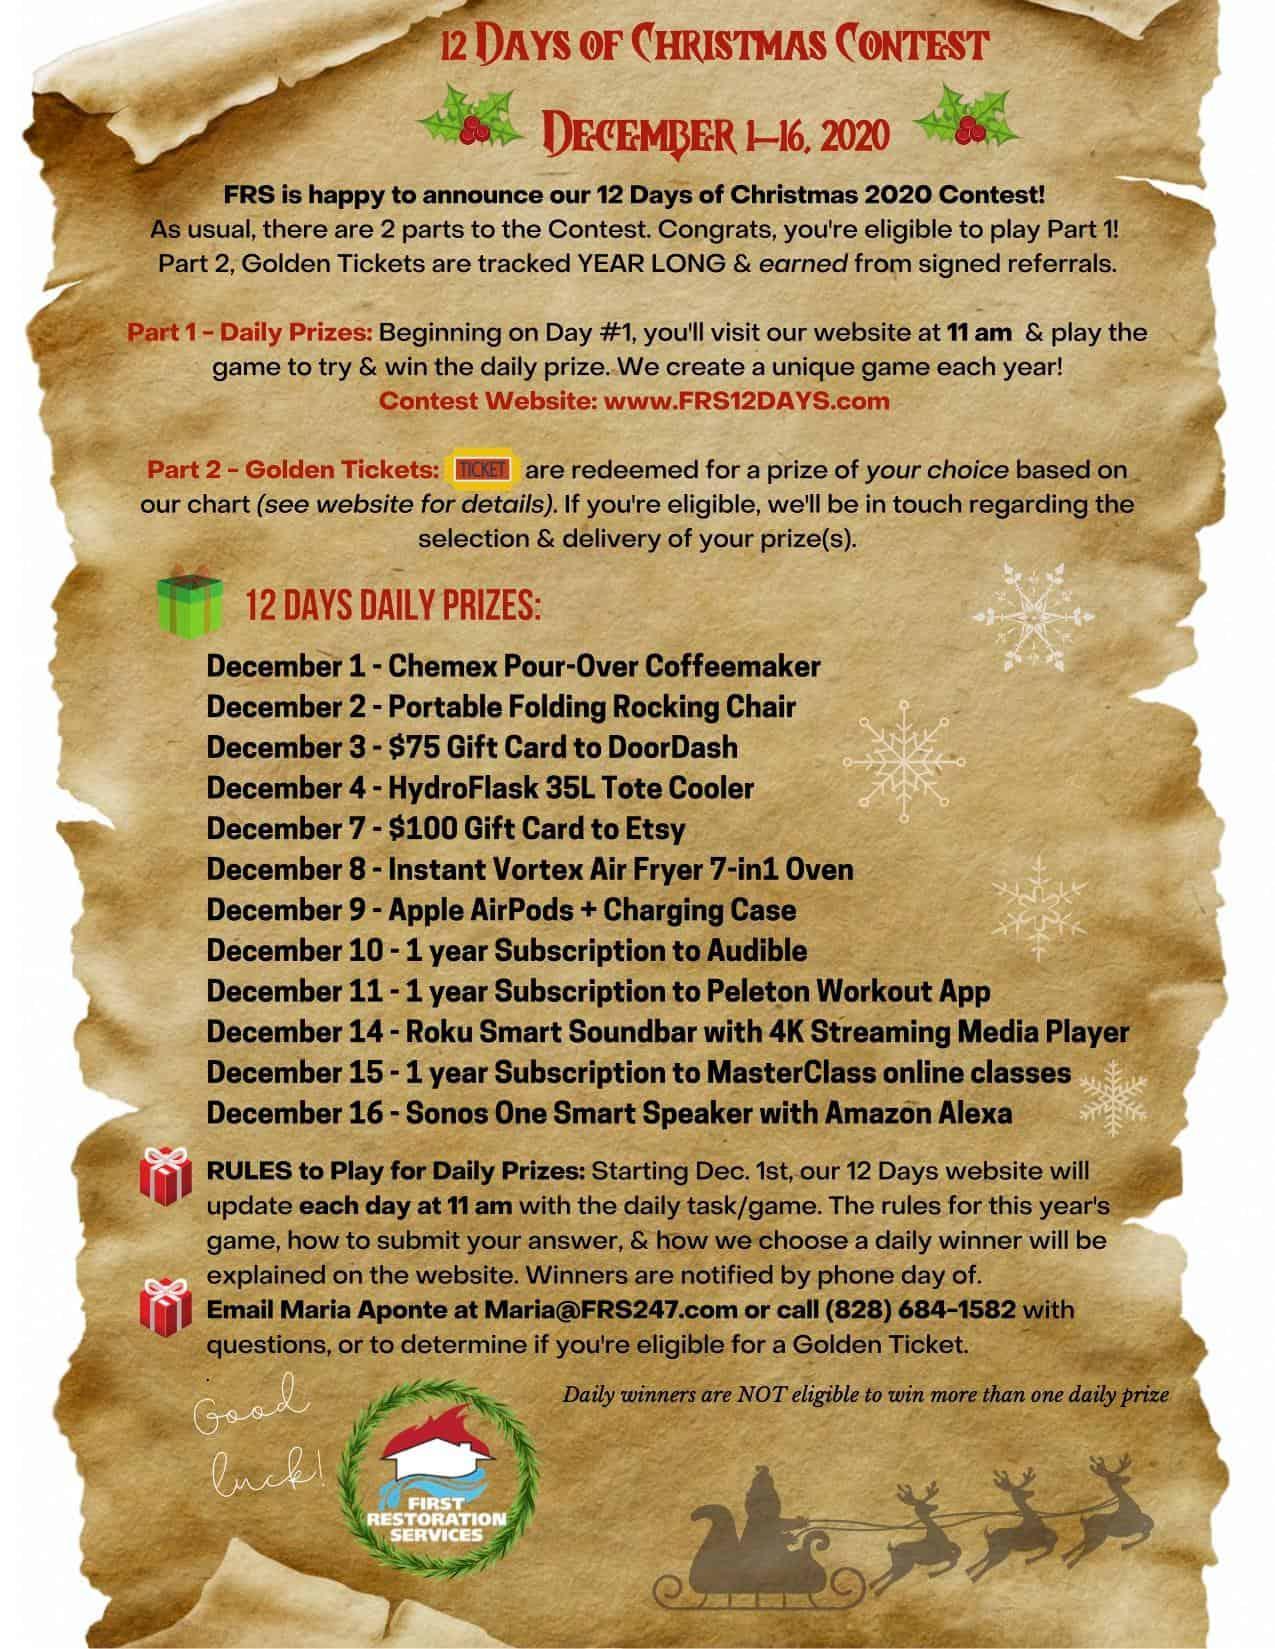 2020 12 days of christmas scroll